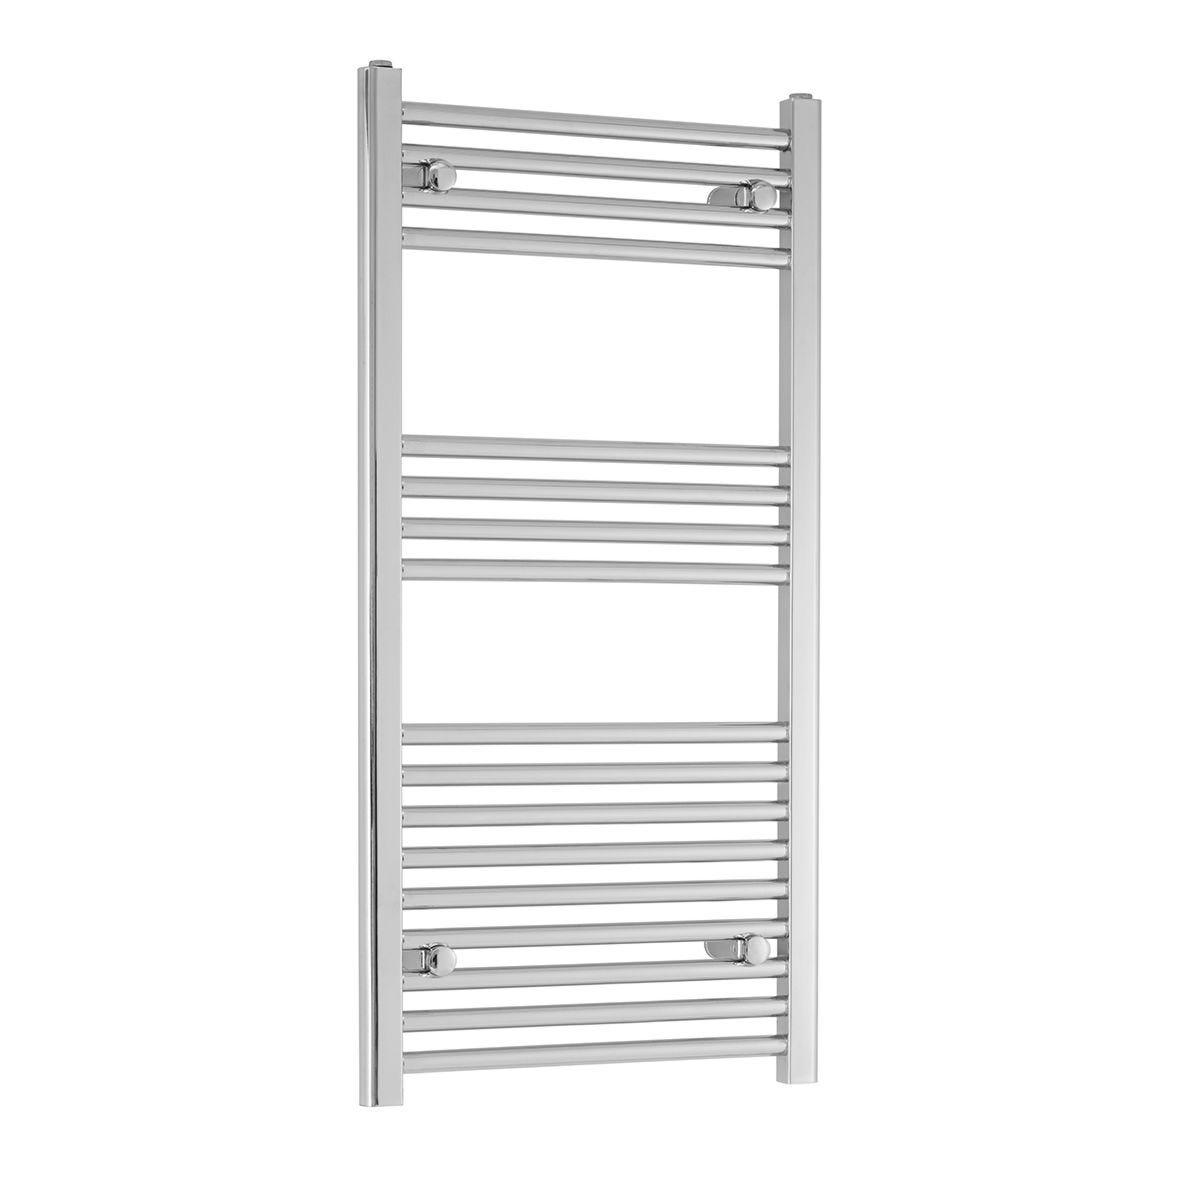 Heating Style Blythe Ladder Rail 1800x500mm Straight - Chrome